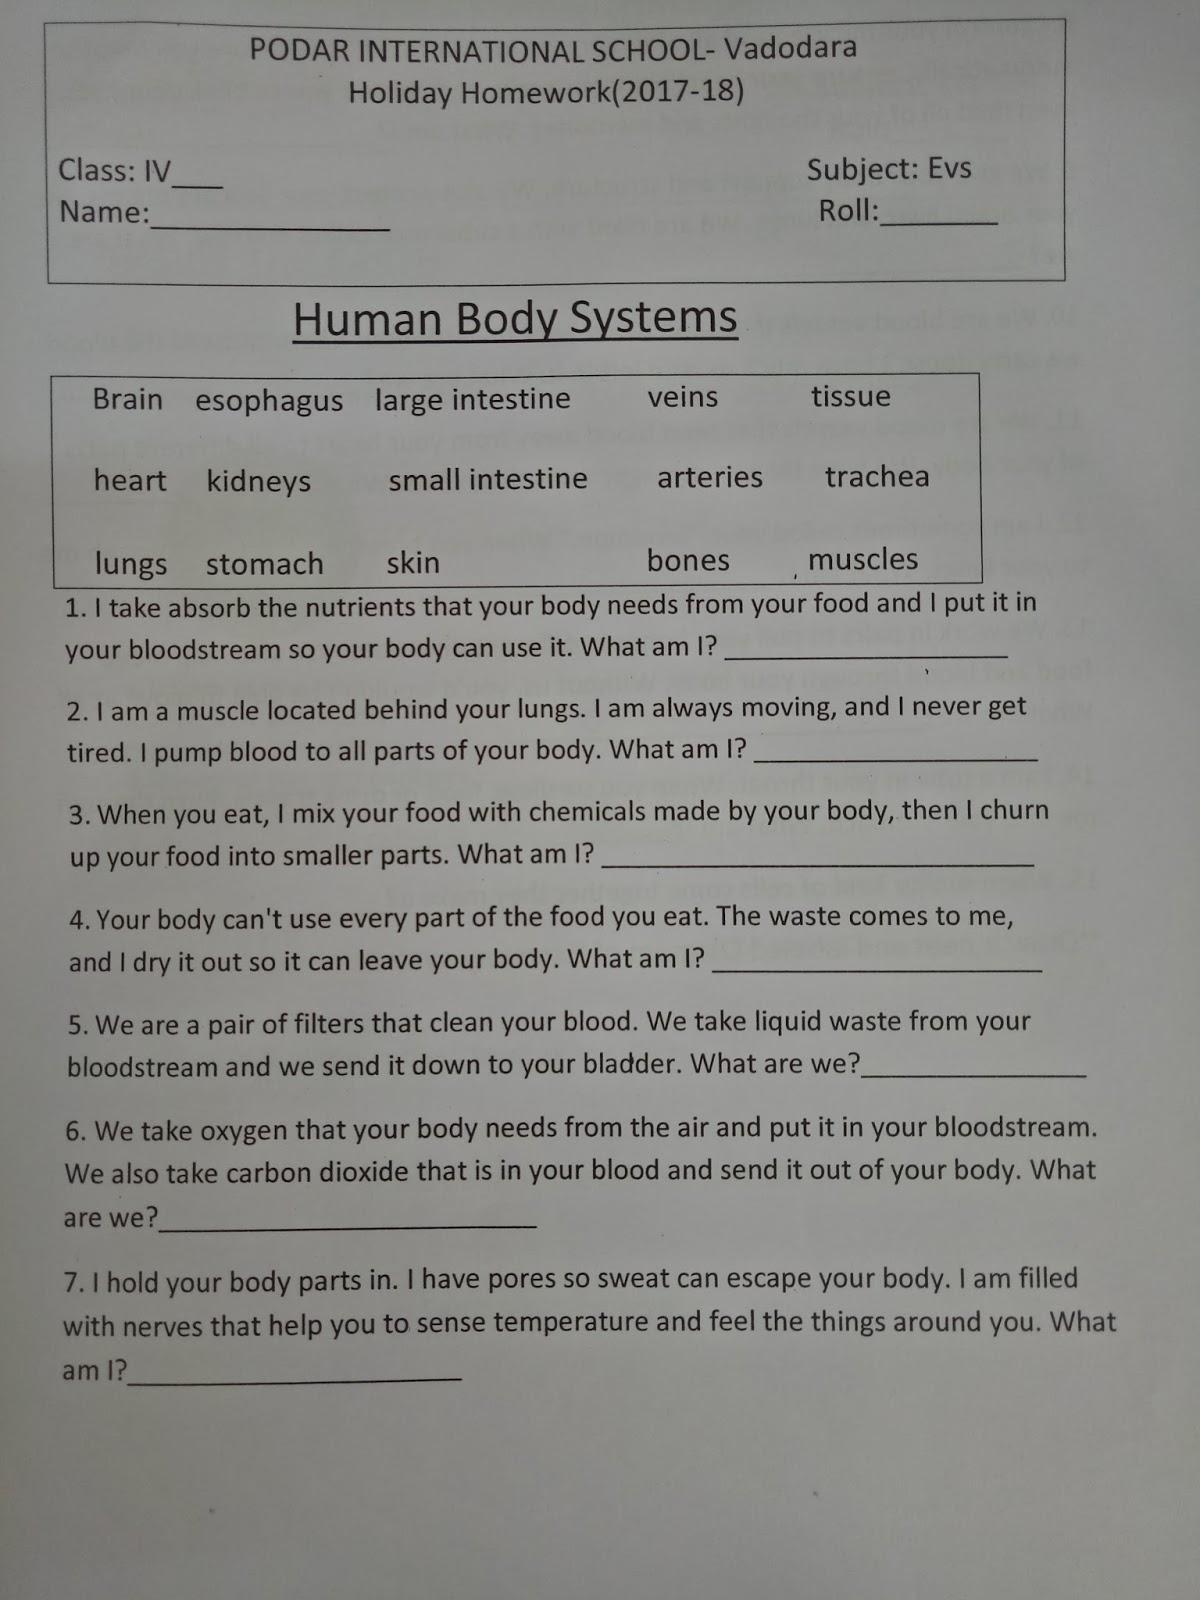 Pis Vadodara Std 4 Evs Human Body Systems Holiday Homework